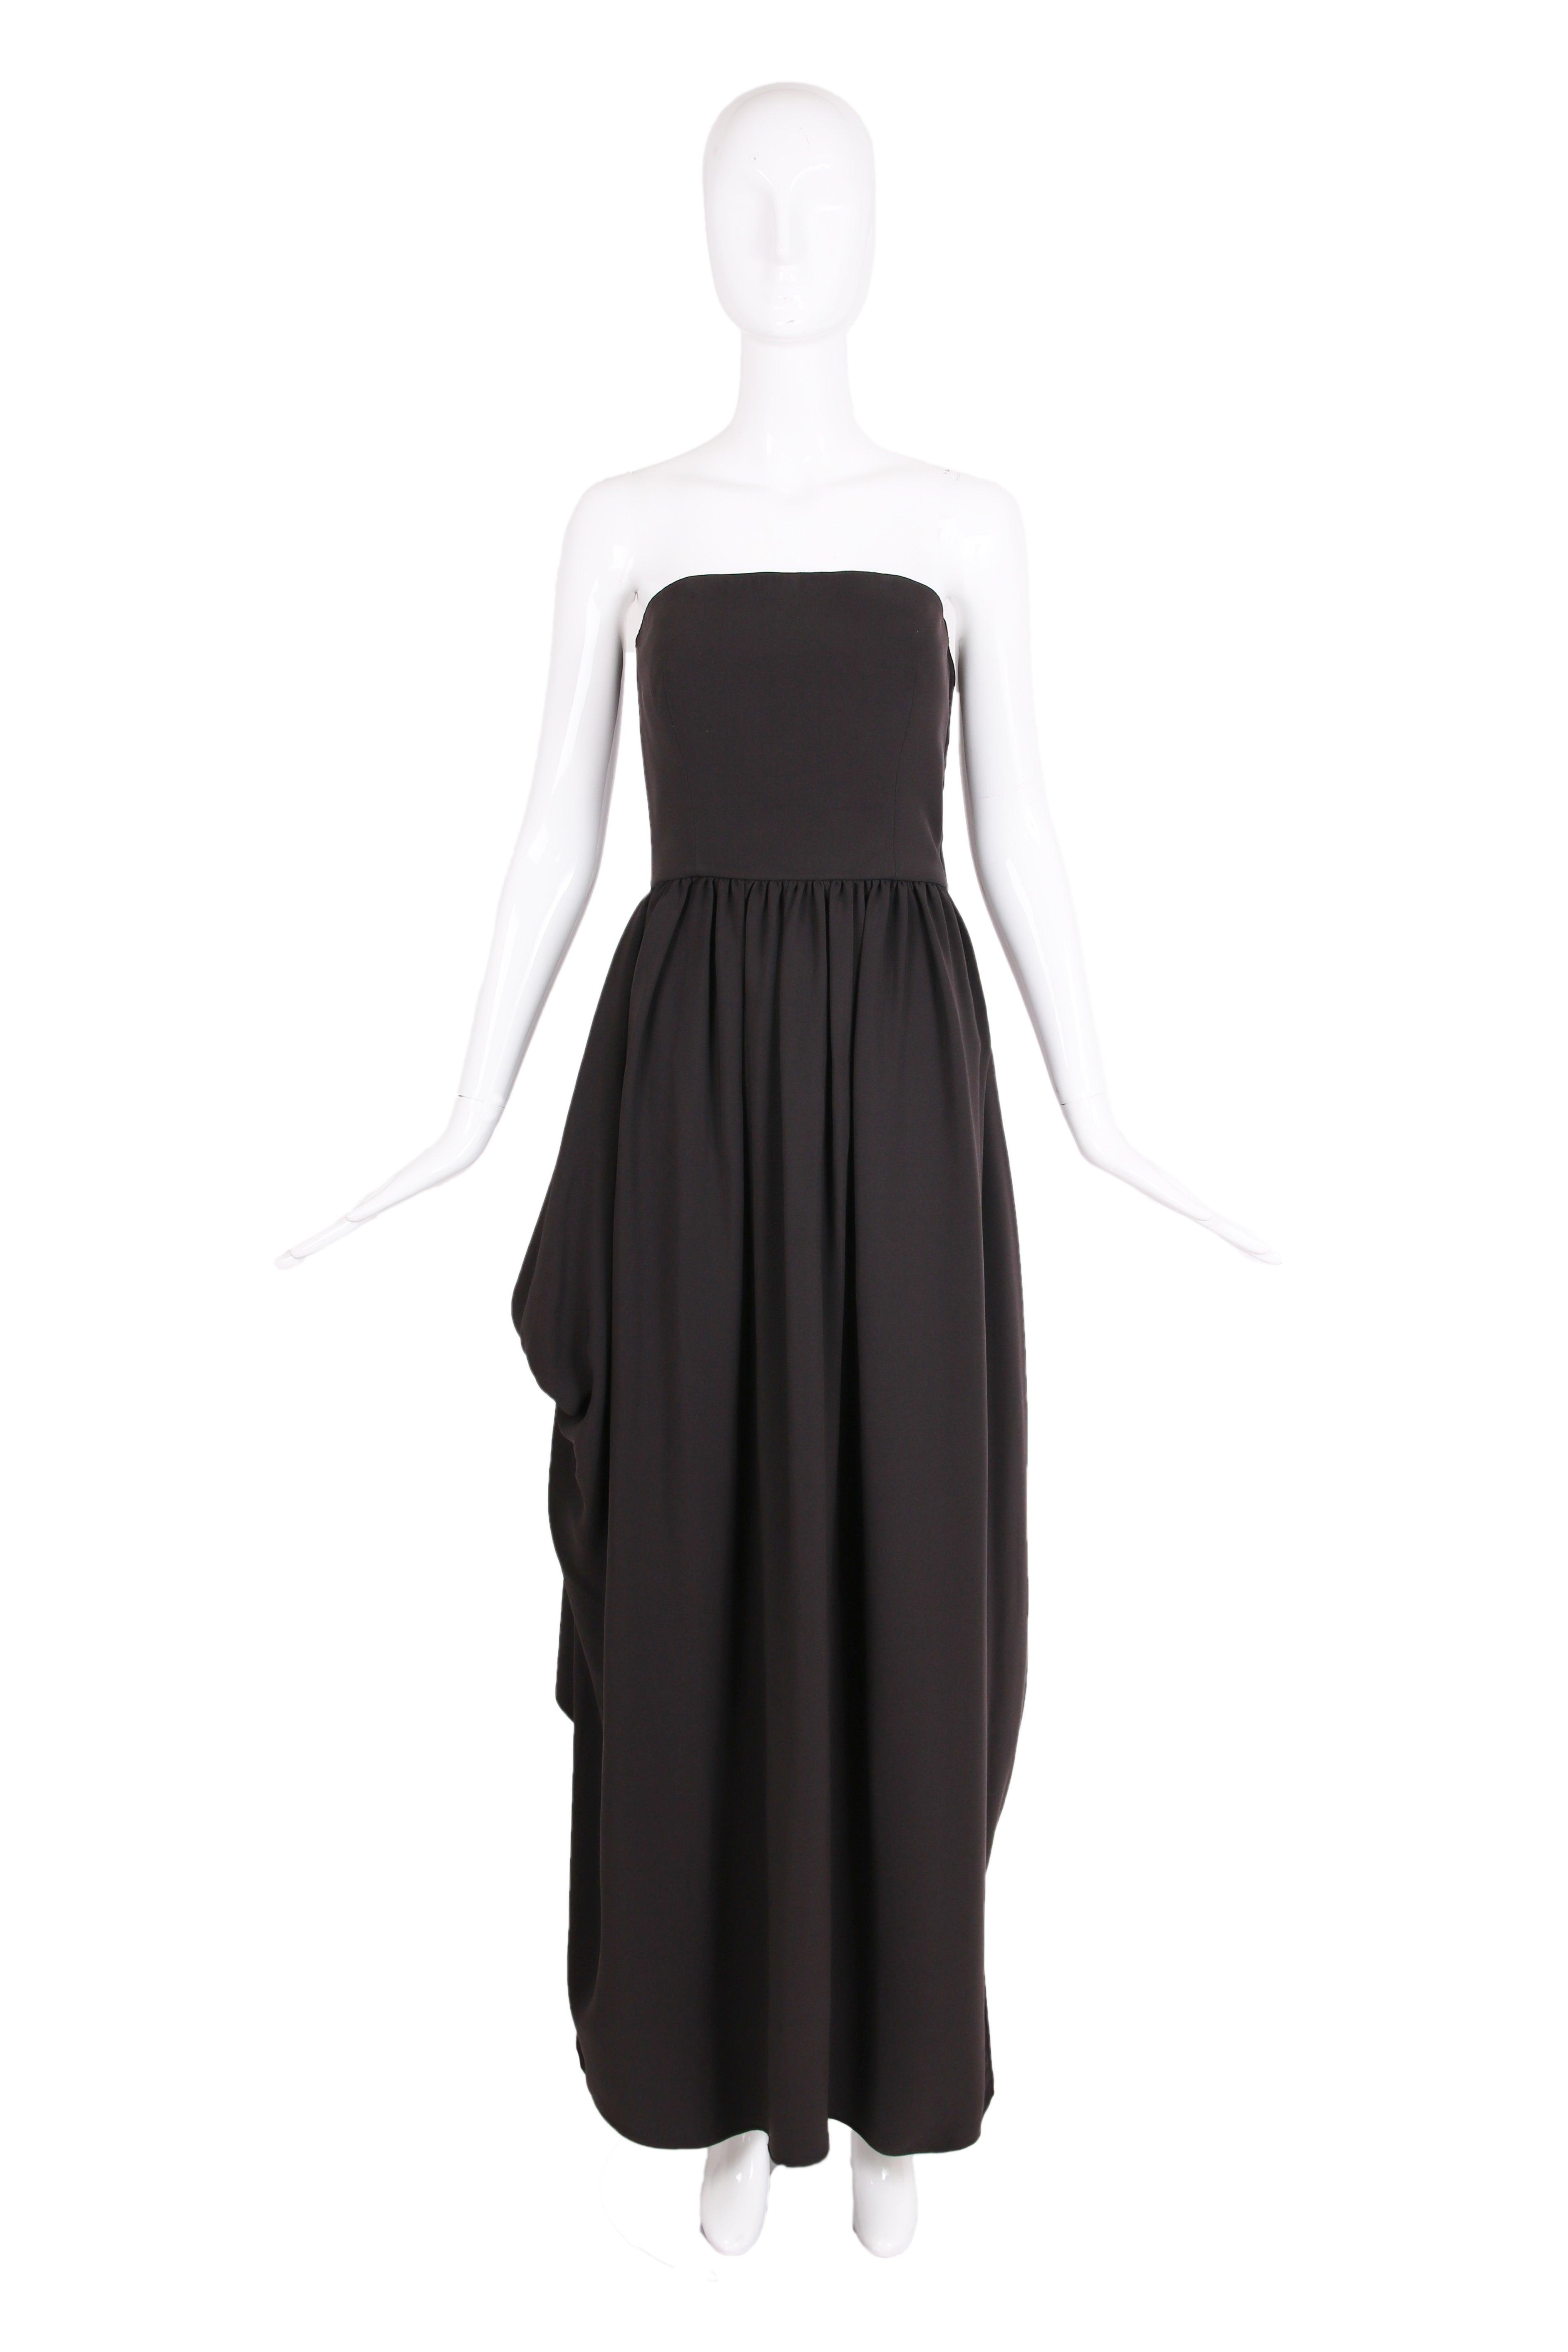 Giorgio Armani Brown Silk Strapless Evening Gown w/Asymmetric Open ...